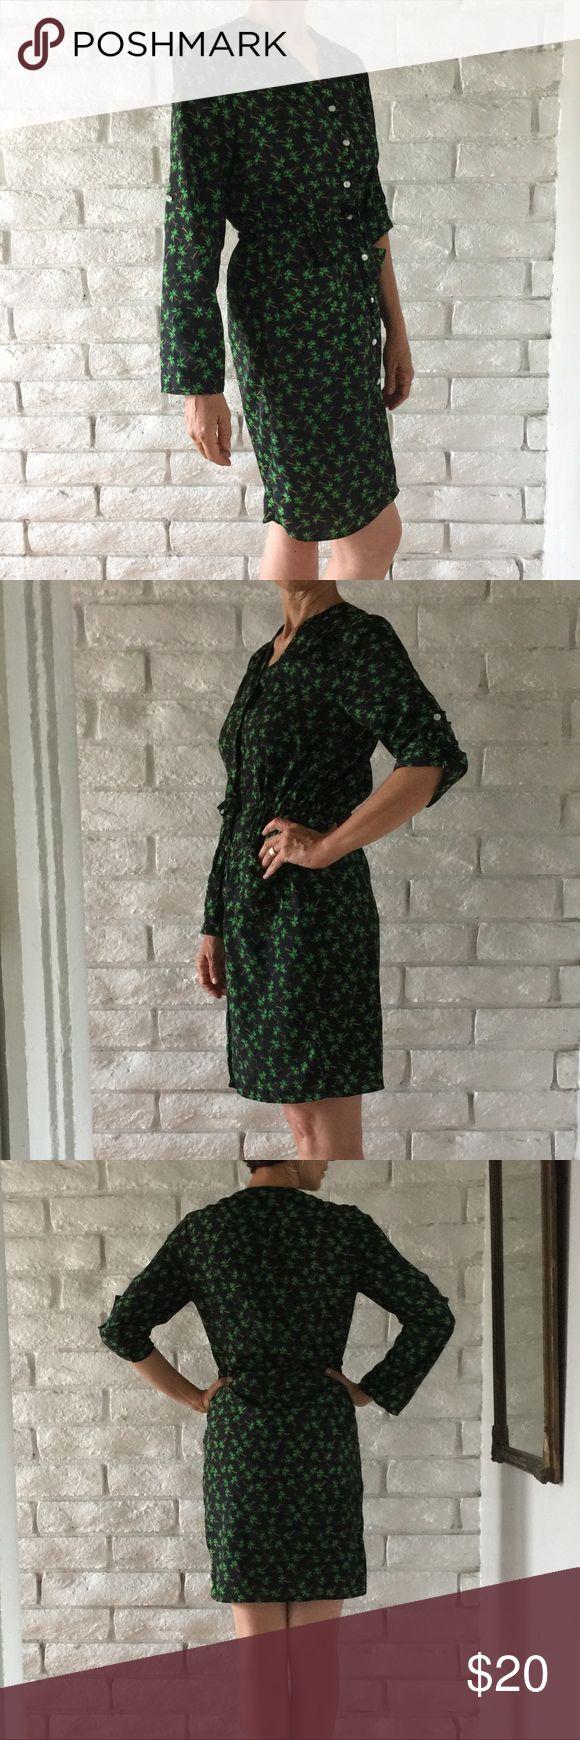 Spense Palm Tree Dress Super cute button down Palm Tree dress. Elastic waist with pockets. Spense Dresses